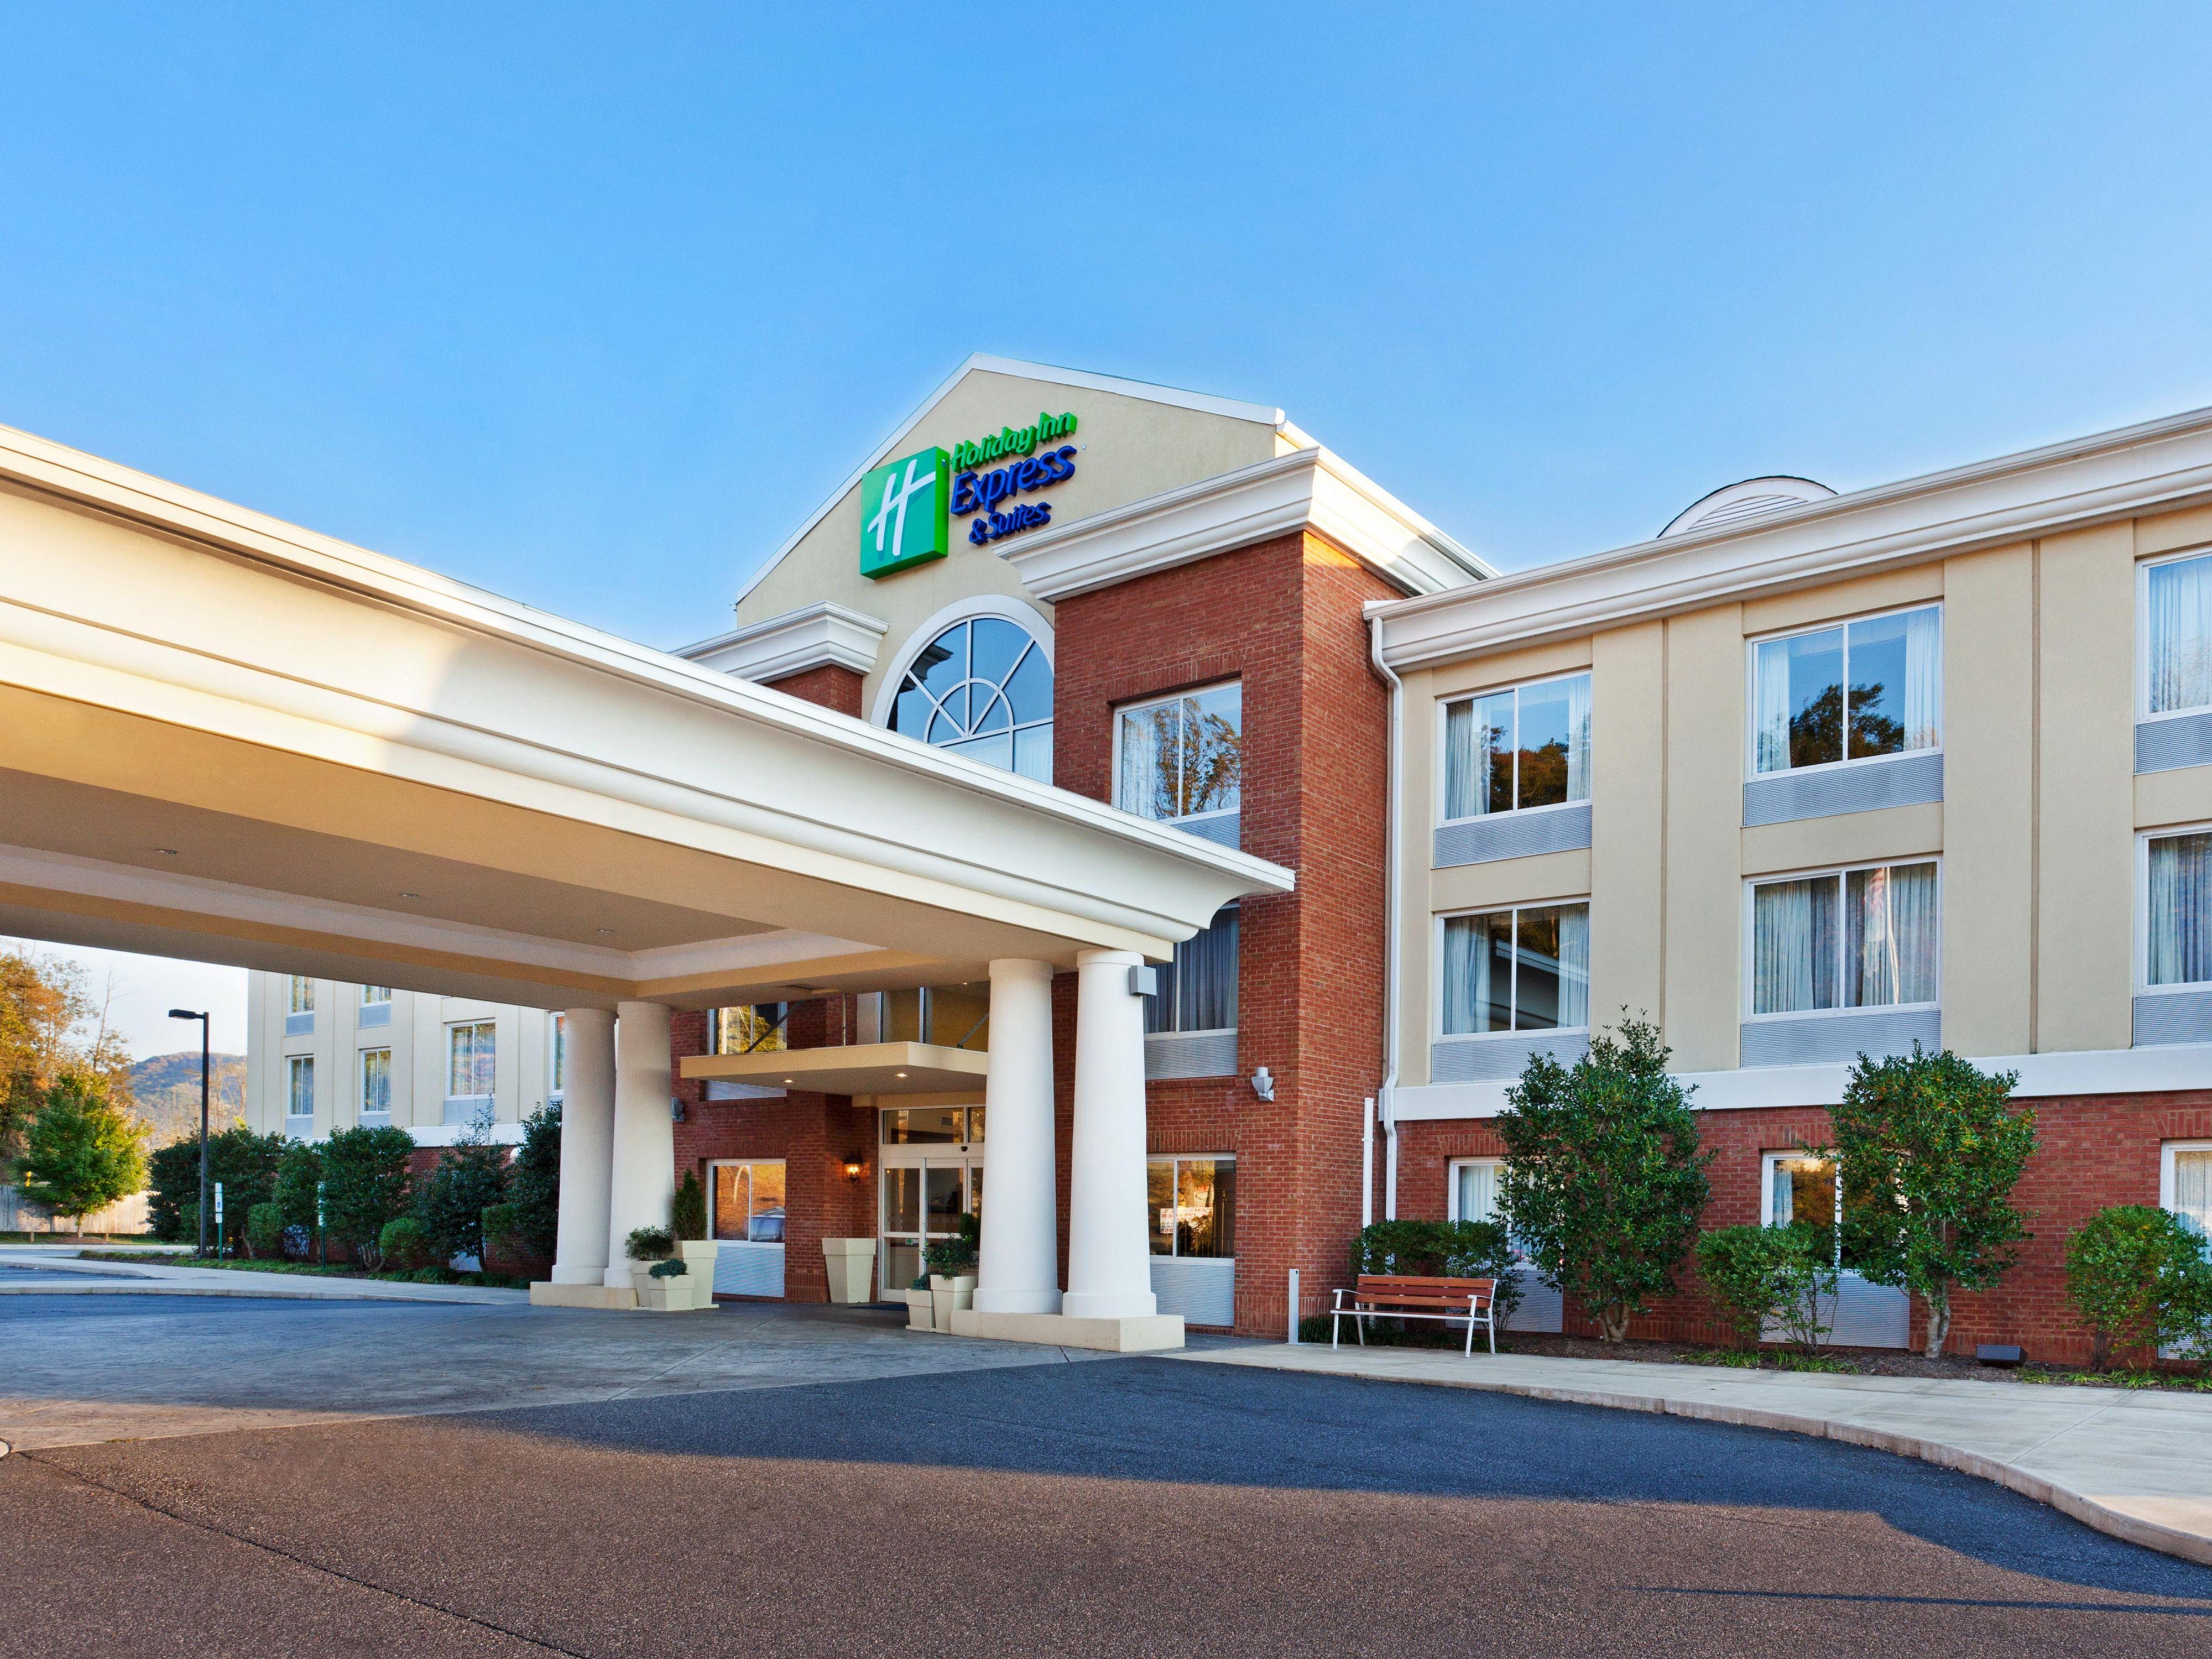 Holiday Inn Express Suites Sylva Western Carolina Area Hotel By Ihg